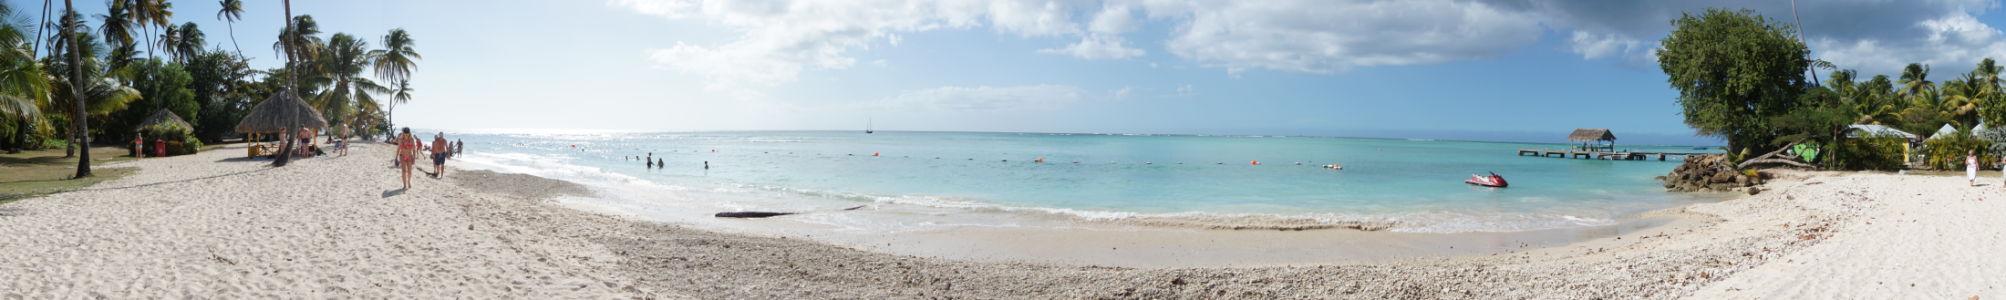 Pláž Pigeon Point